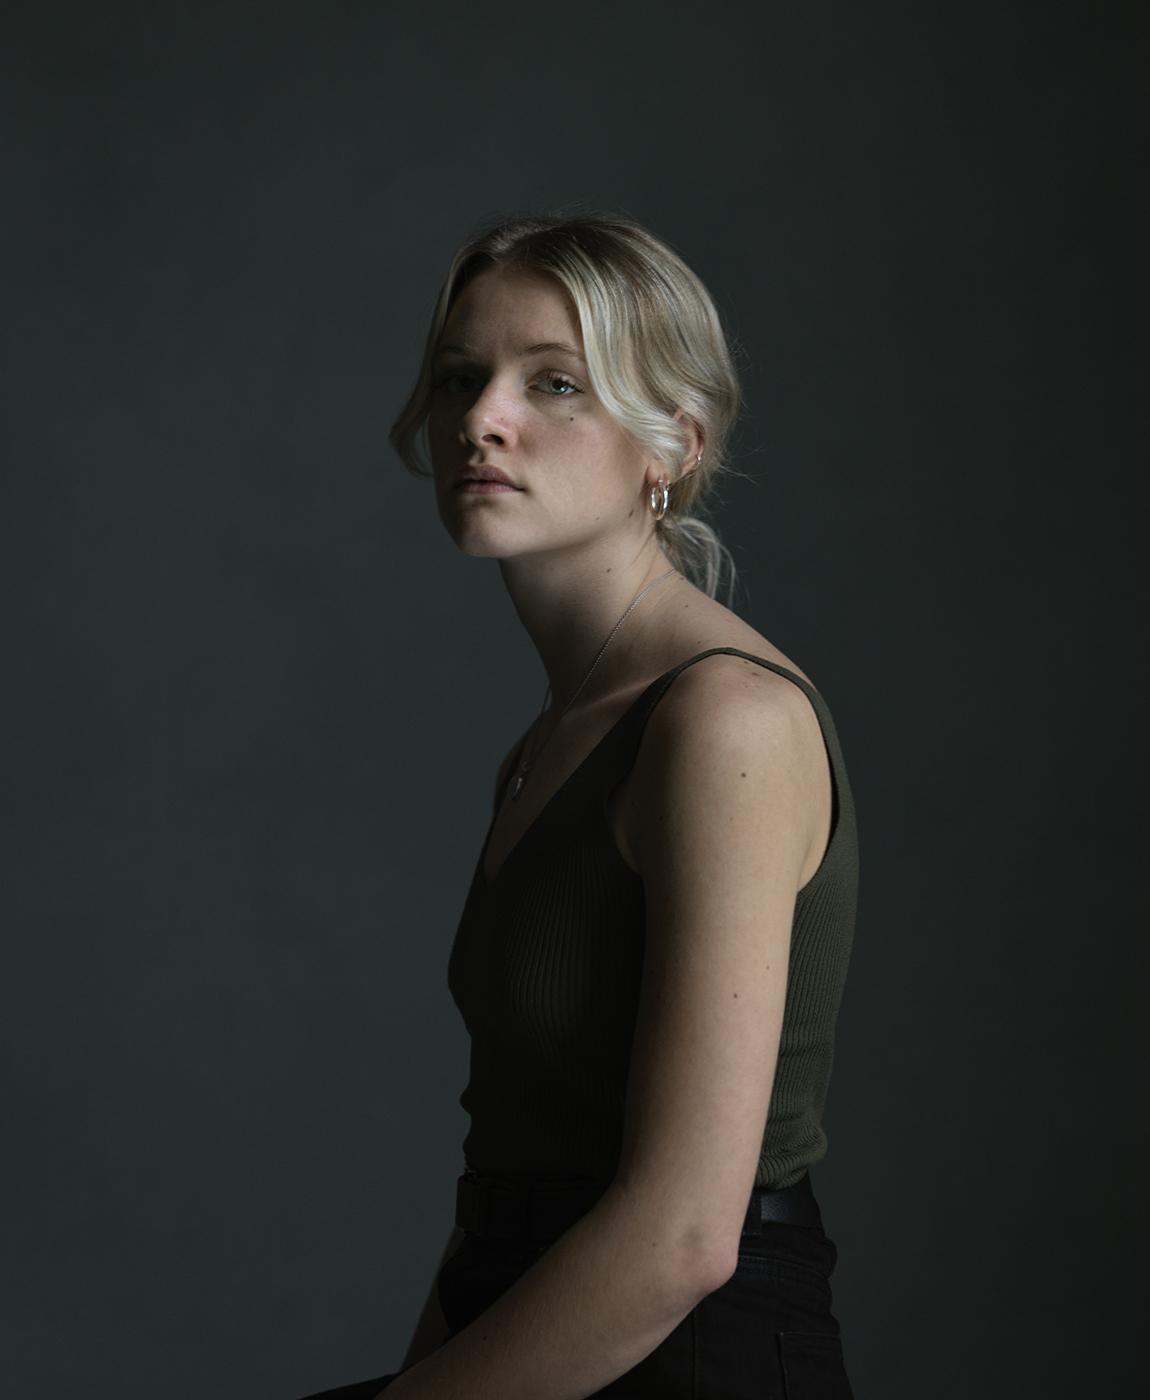 portret, portrait, portretfotografie, portraitphotography,Susanne Middelberg